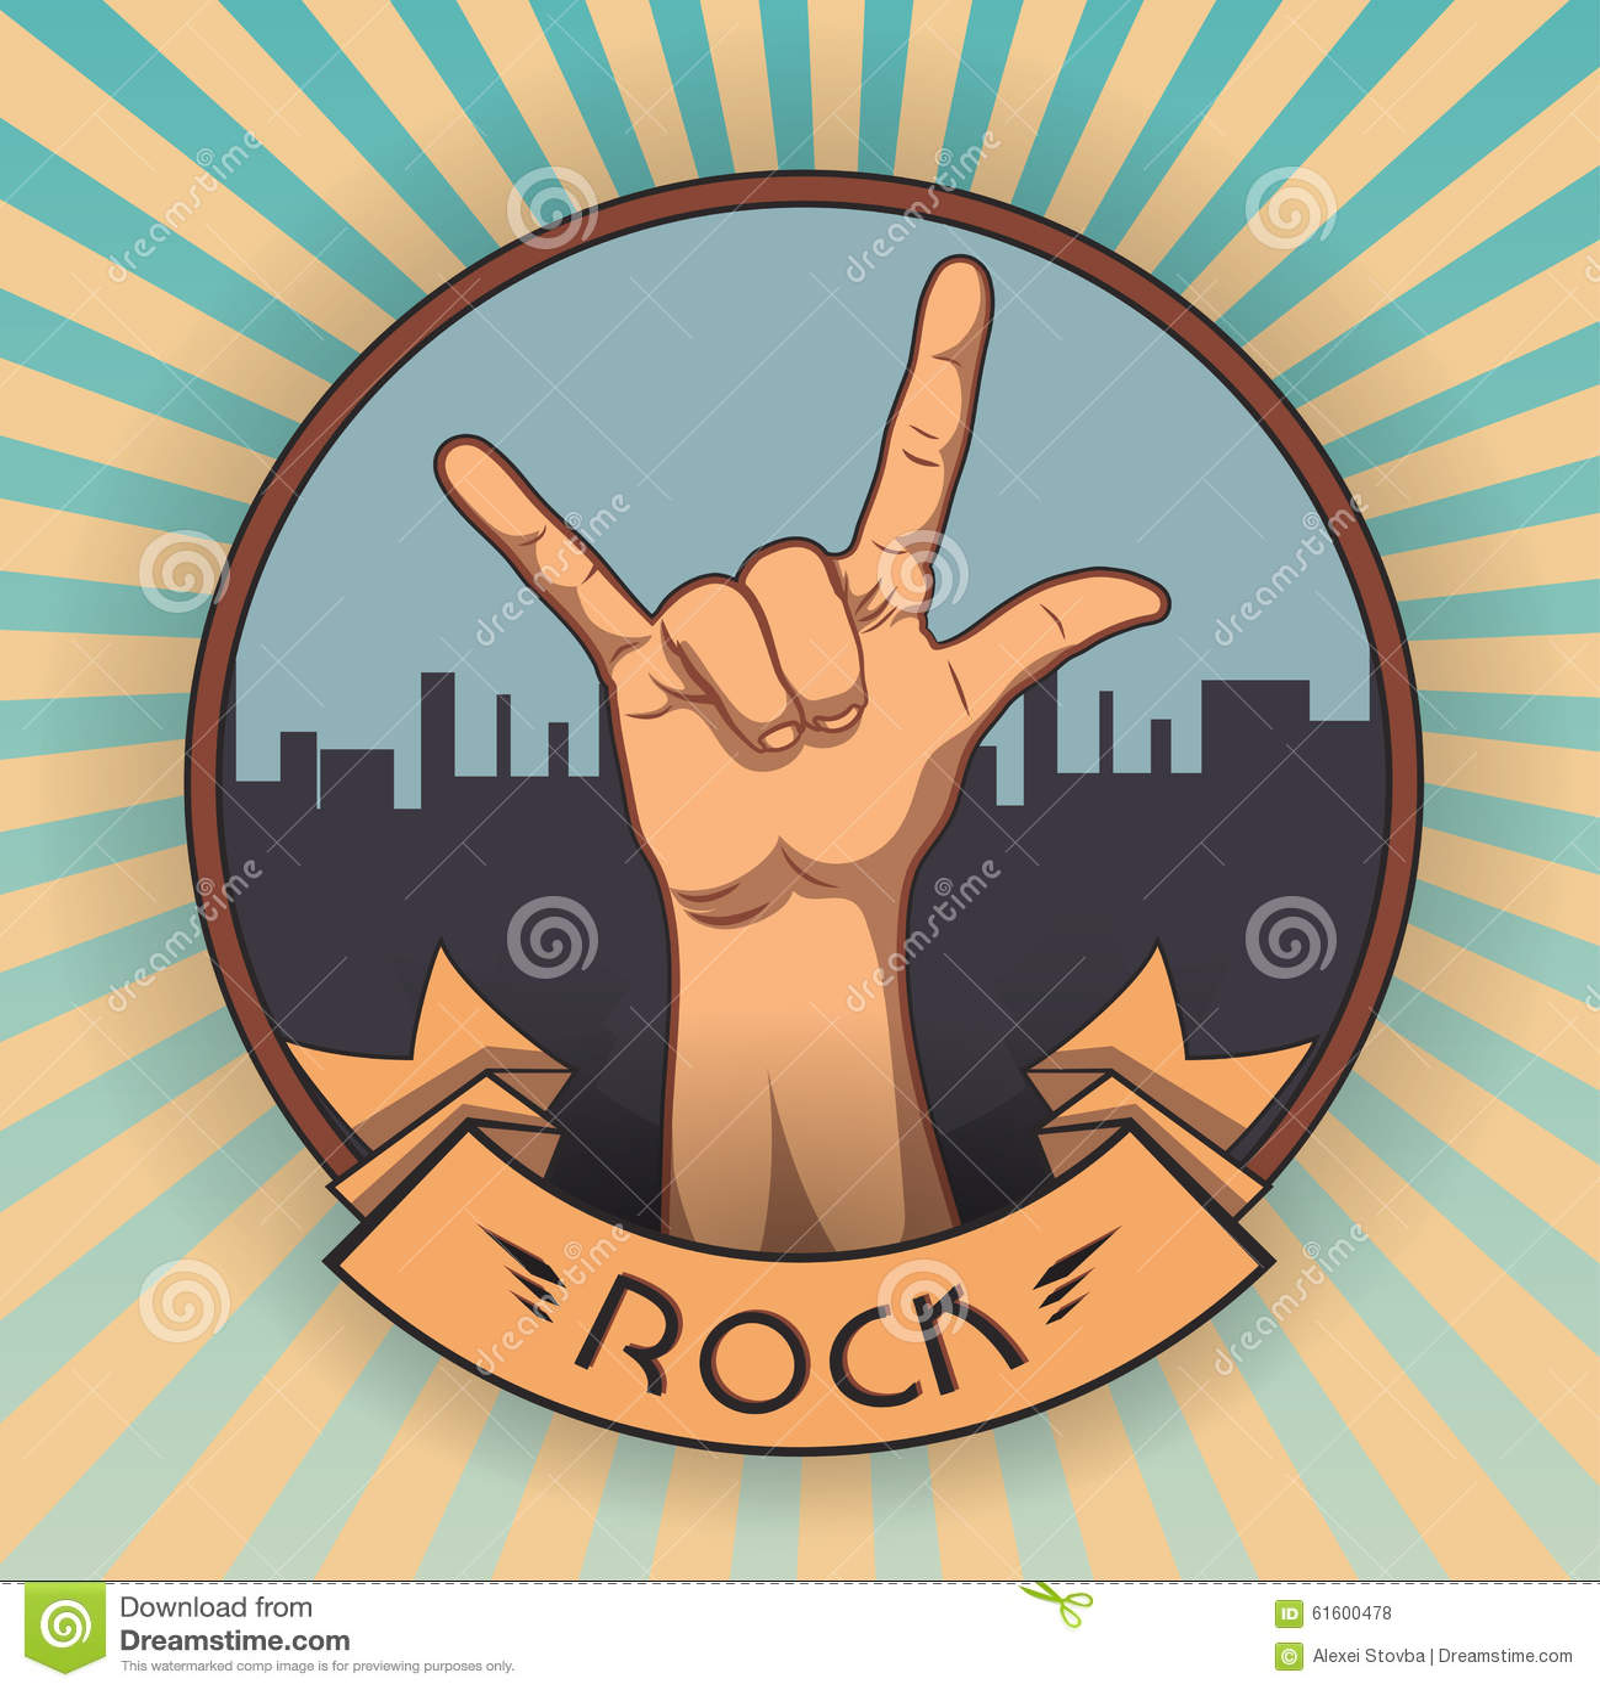 Hand in rock n roll sign retro rock poster illustration 61600478 hand in rock n roll sign retro rock poster illustration 61600478 megapixl buycottarizona